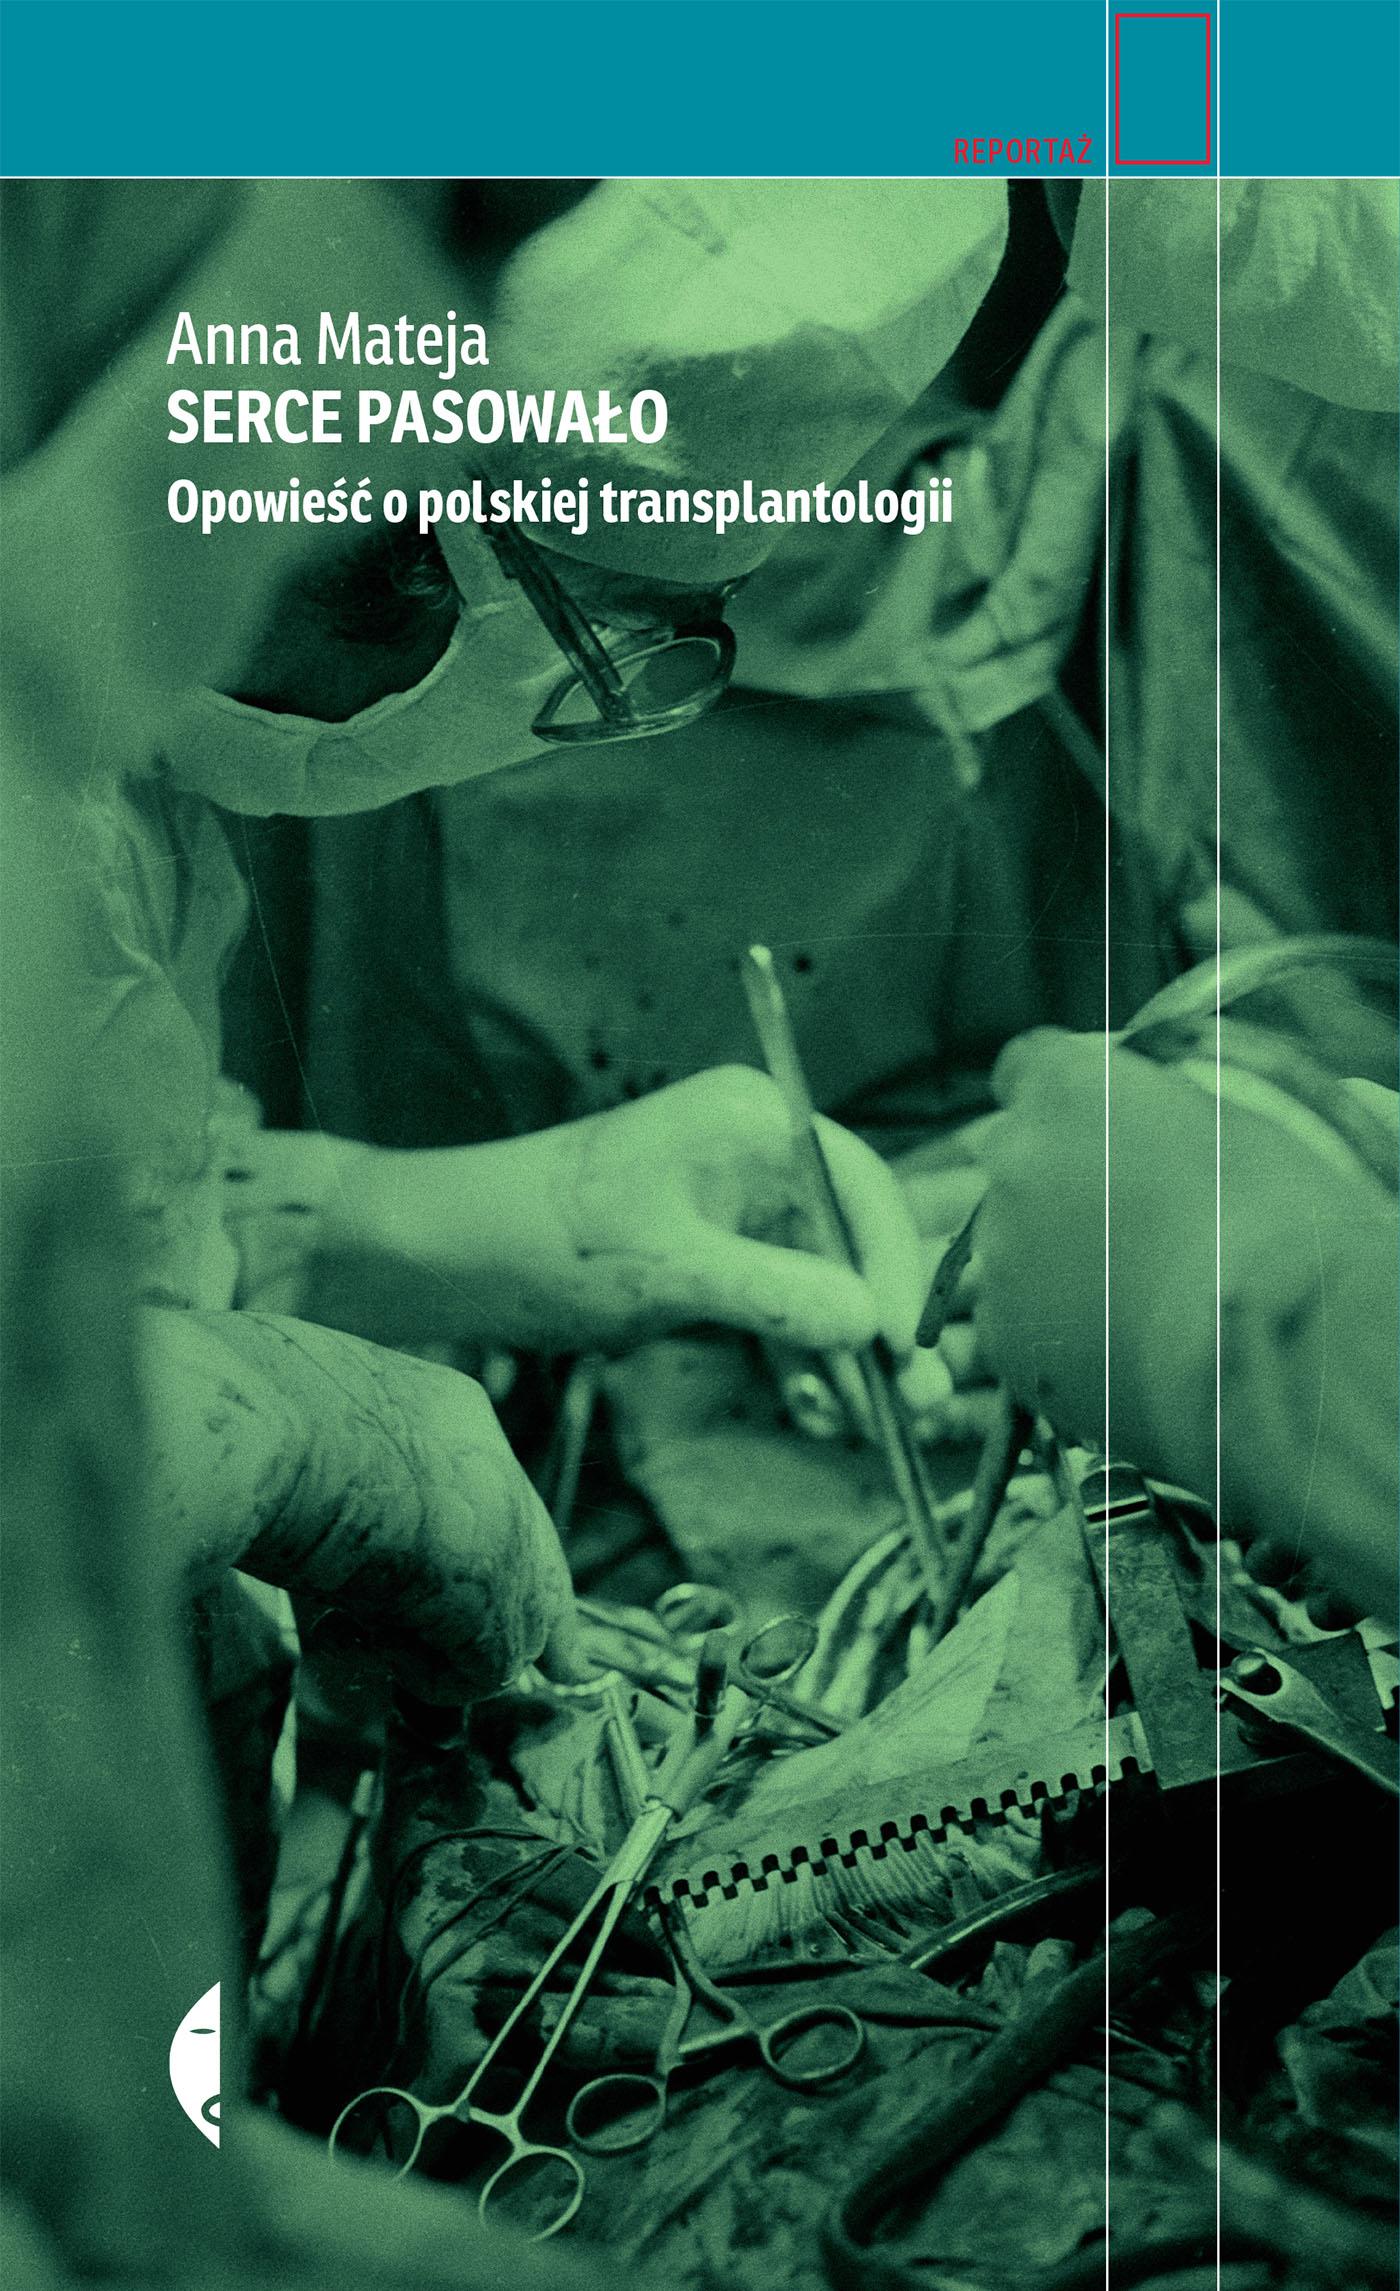 http://czarne.com.pl/uploads/catalog/product/cover/714/serce_pasowalo.jpg